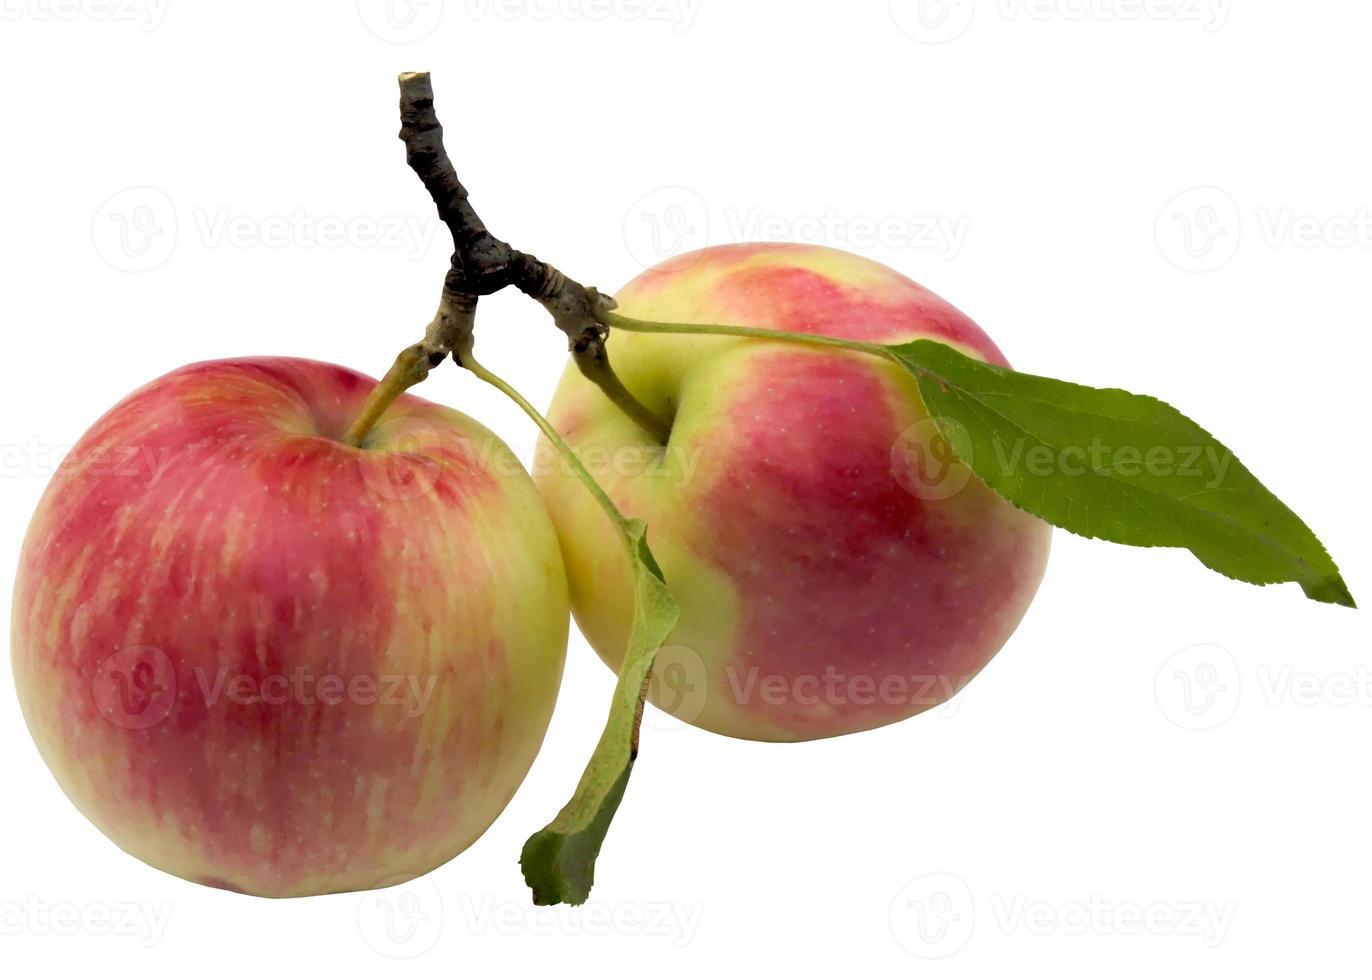 herfst appels. foto